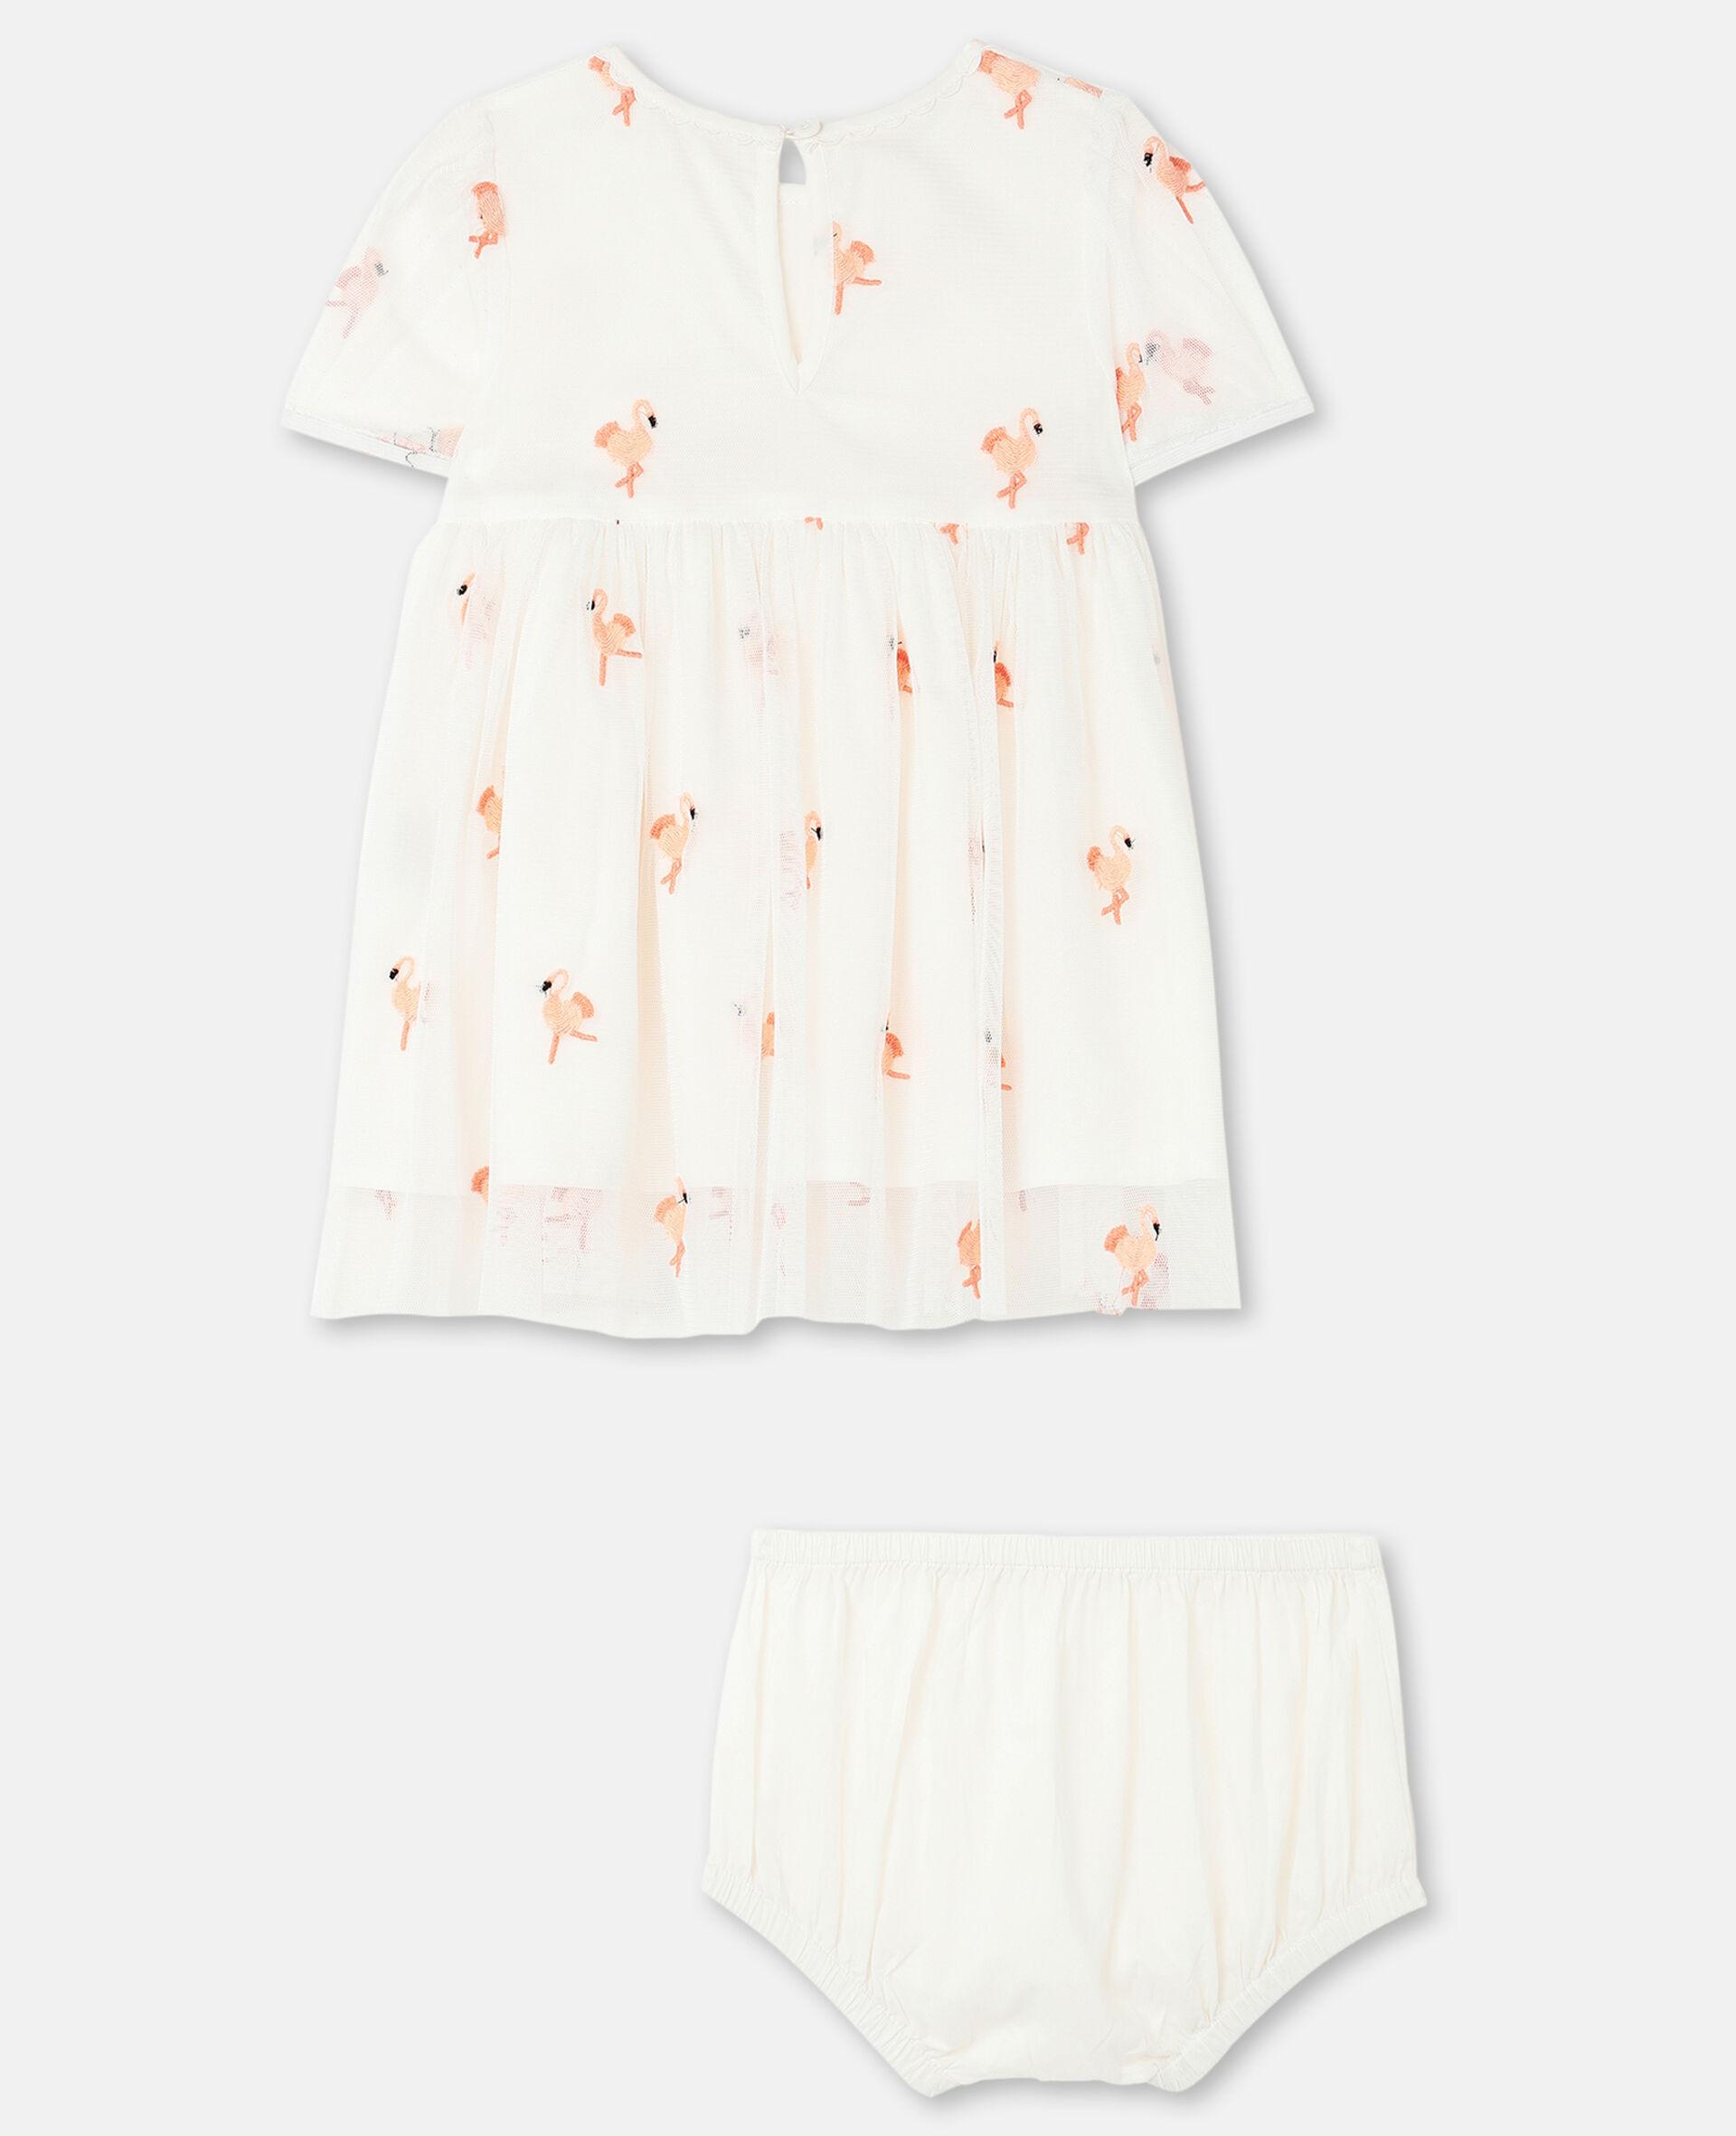 Robe en tulle avec flamants roses brodés-Blanc-large image number 3